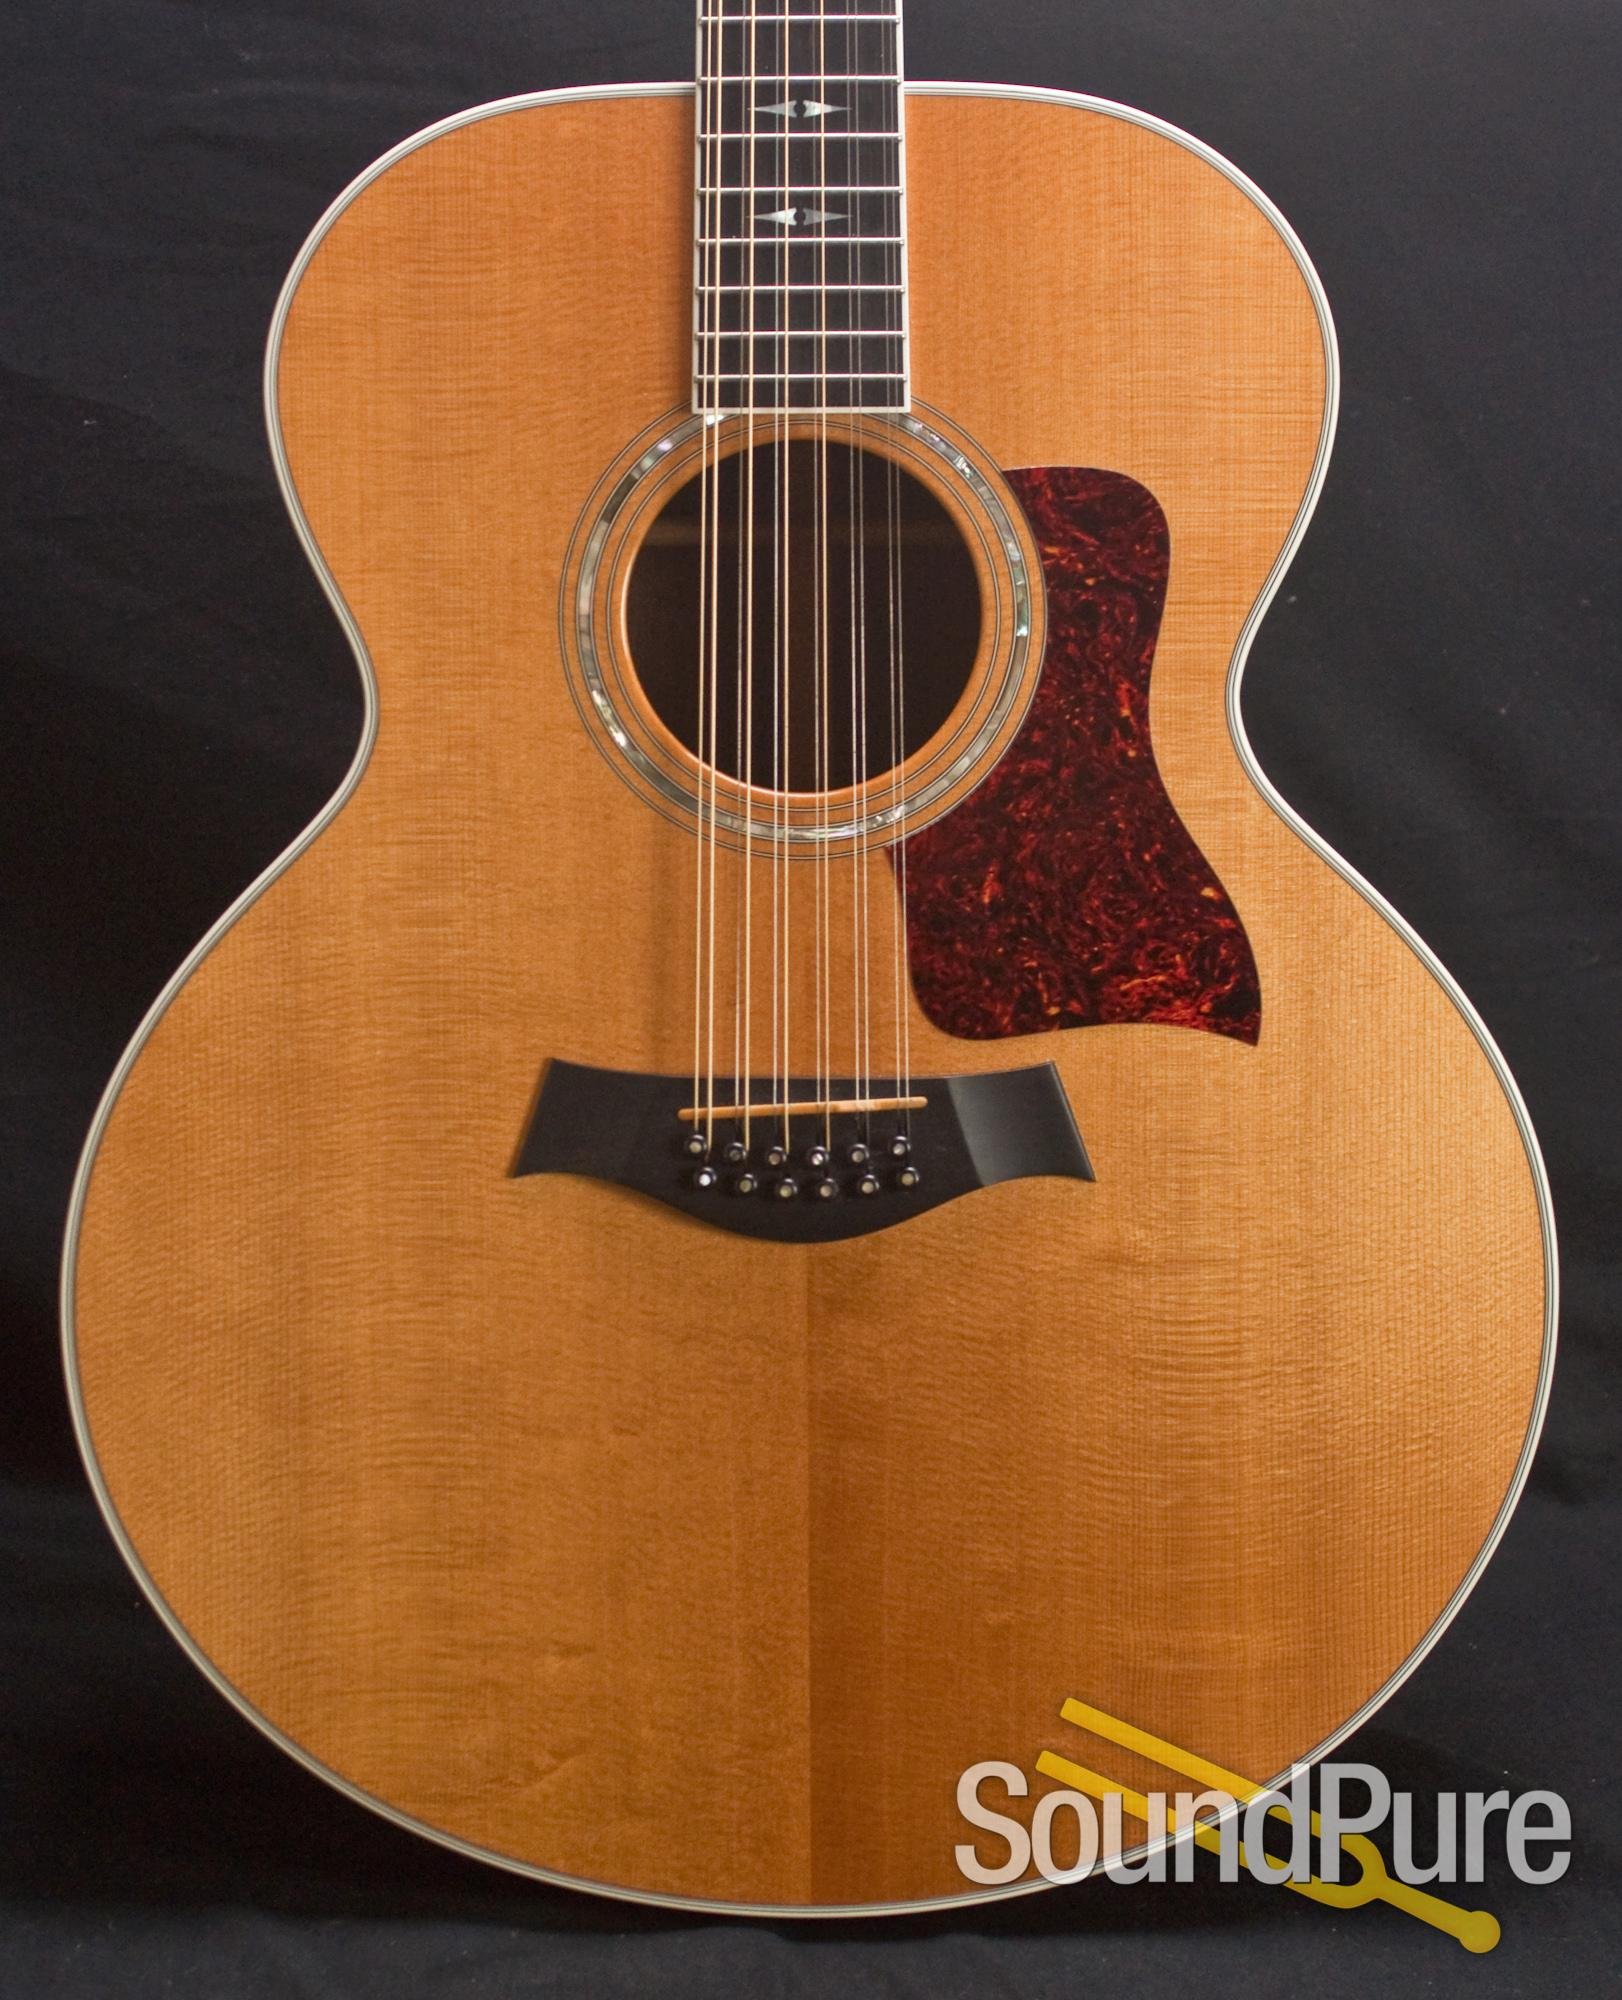 taylor 855e 12 string jumbo acoustic guitar 1996 used used. Black Bedroom Furniture Sets. Home Design Ideas